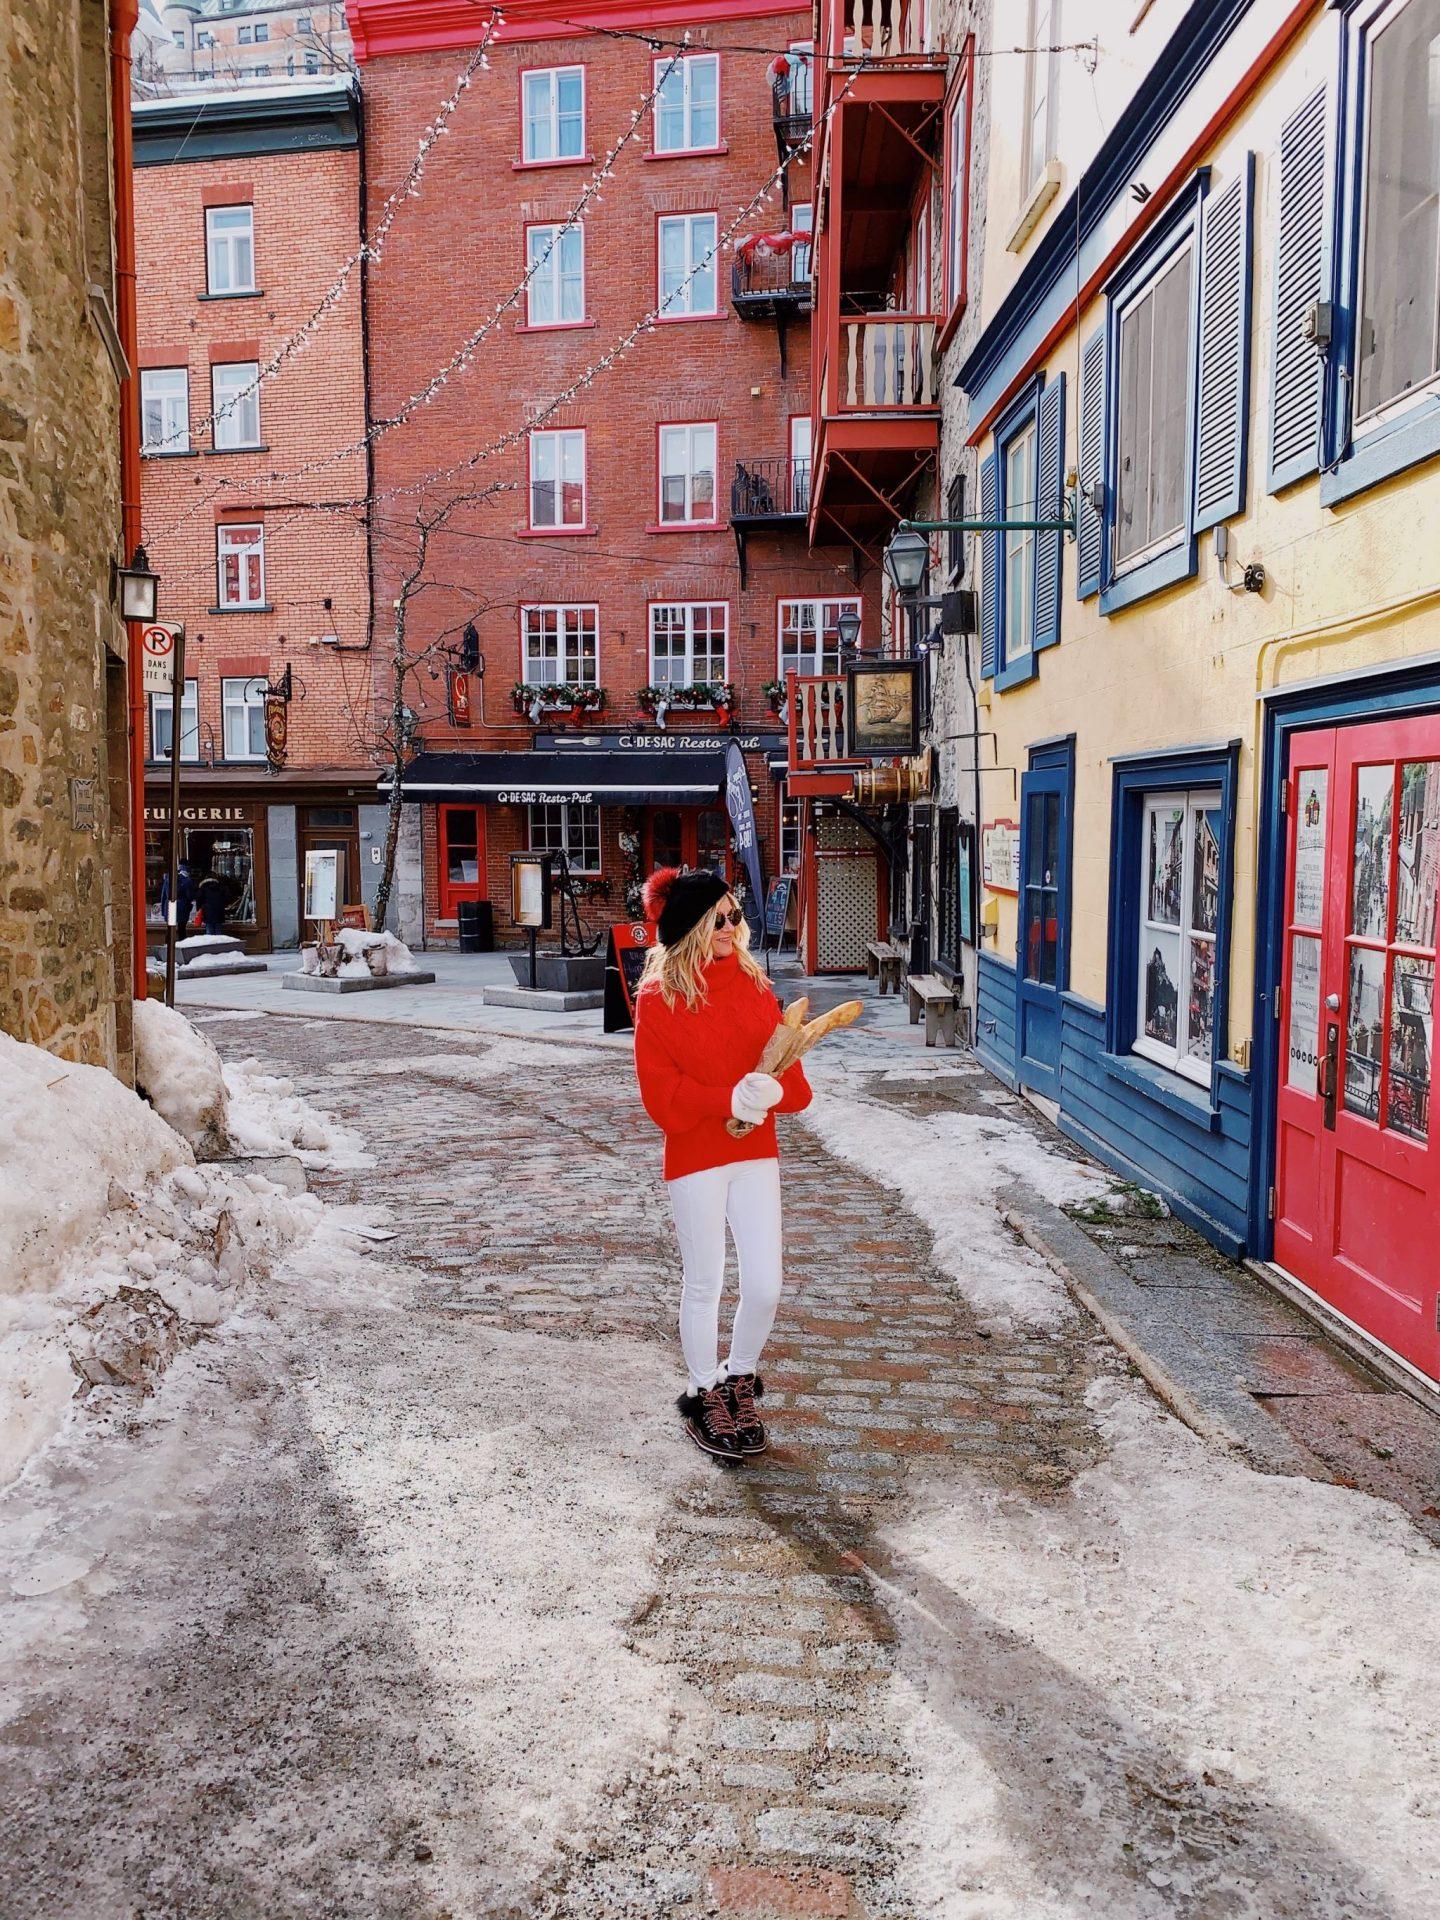 Instagrammable Spots In Quebec City